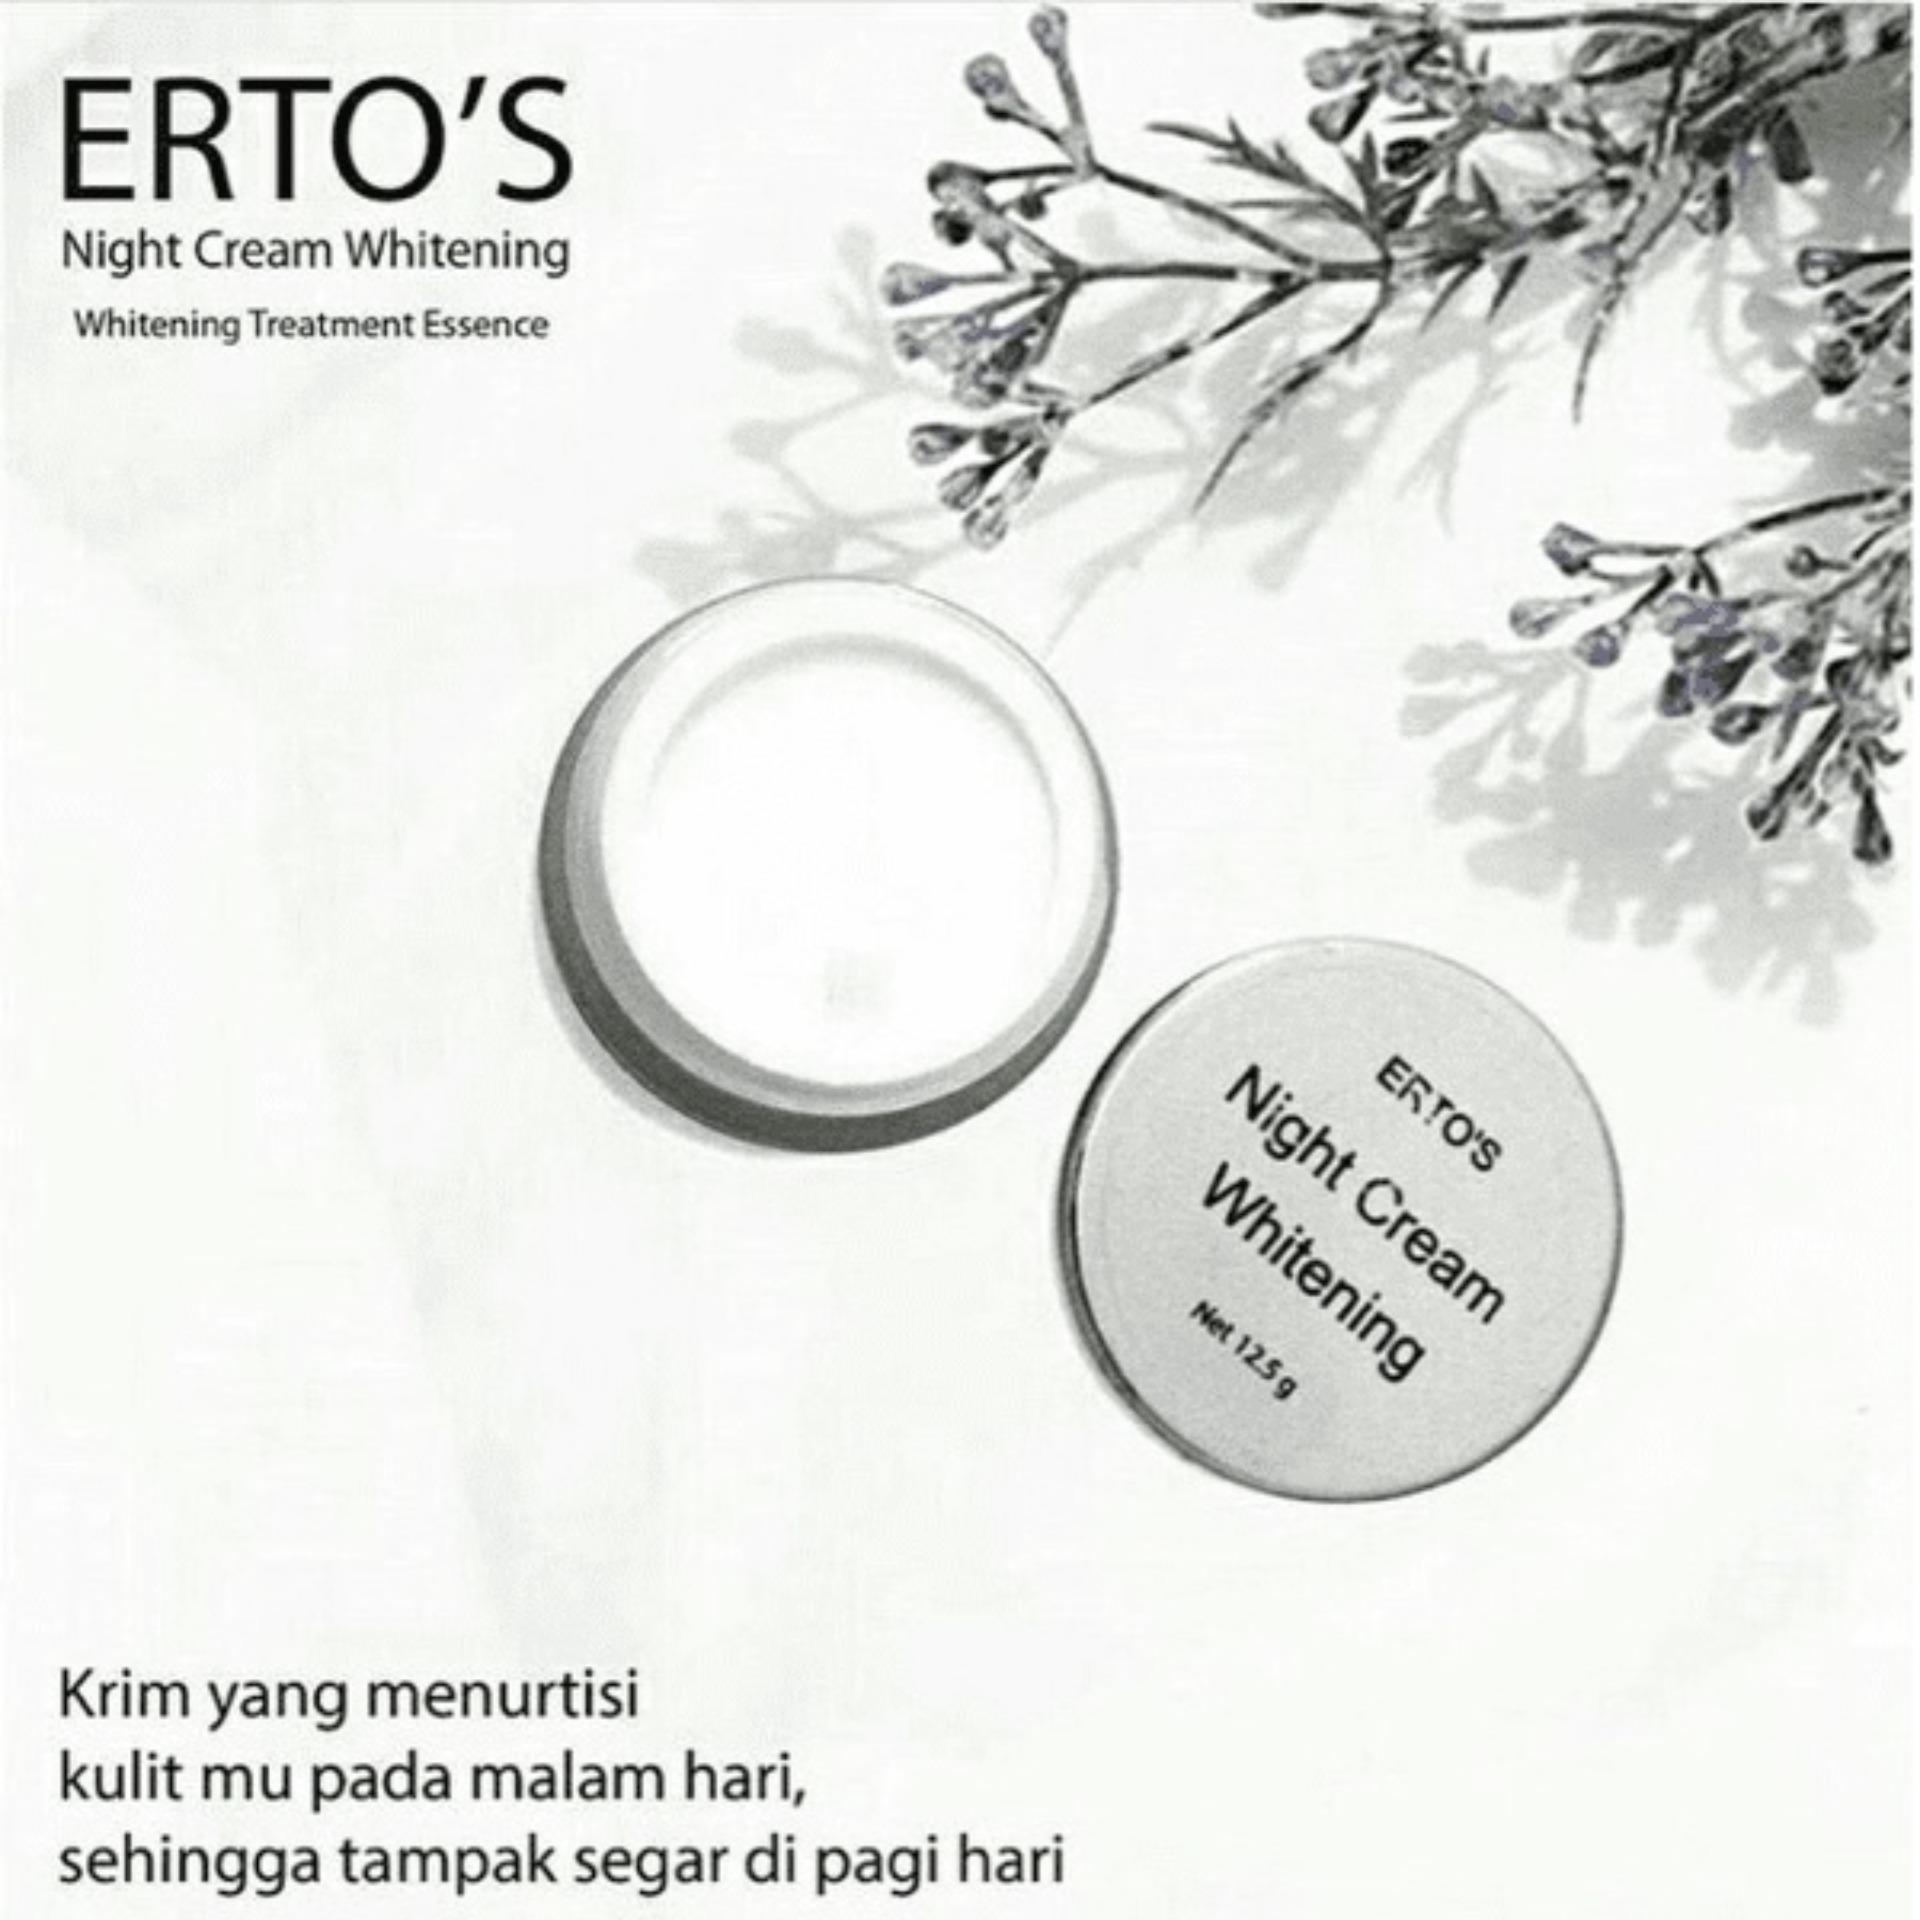 ERTOS Dermo Night Care Whitening Cream - Krim Malam - ERTO'S Skincare